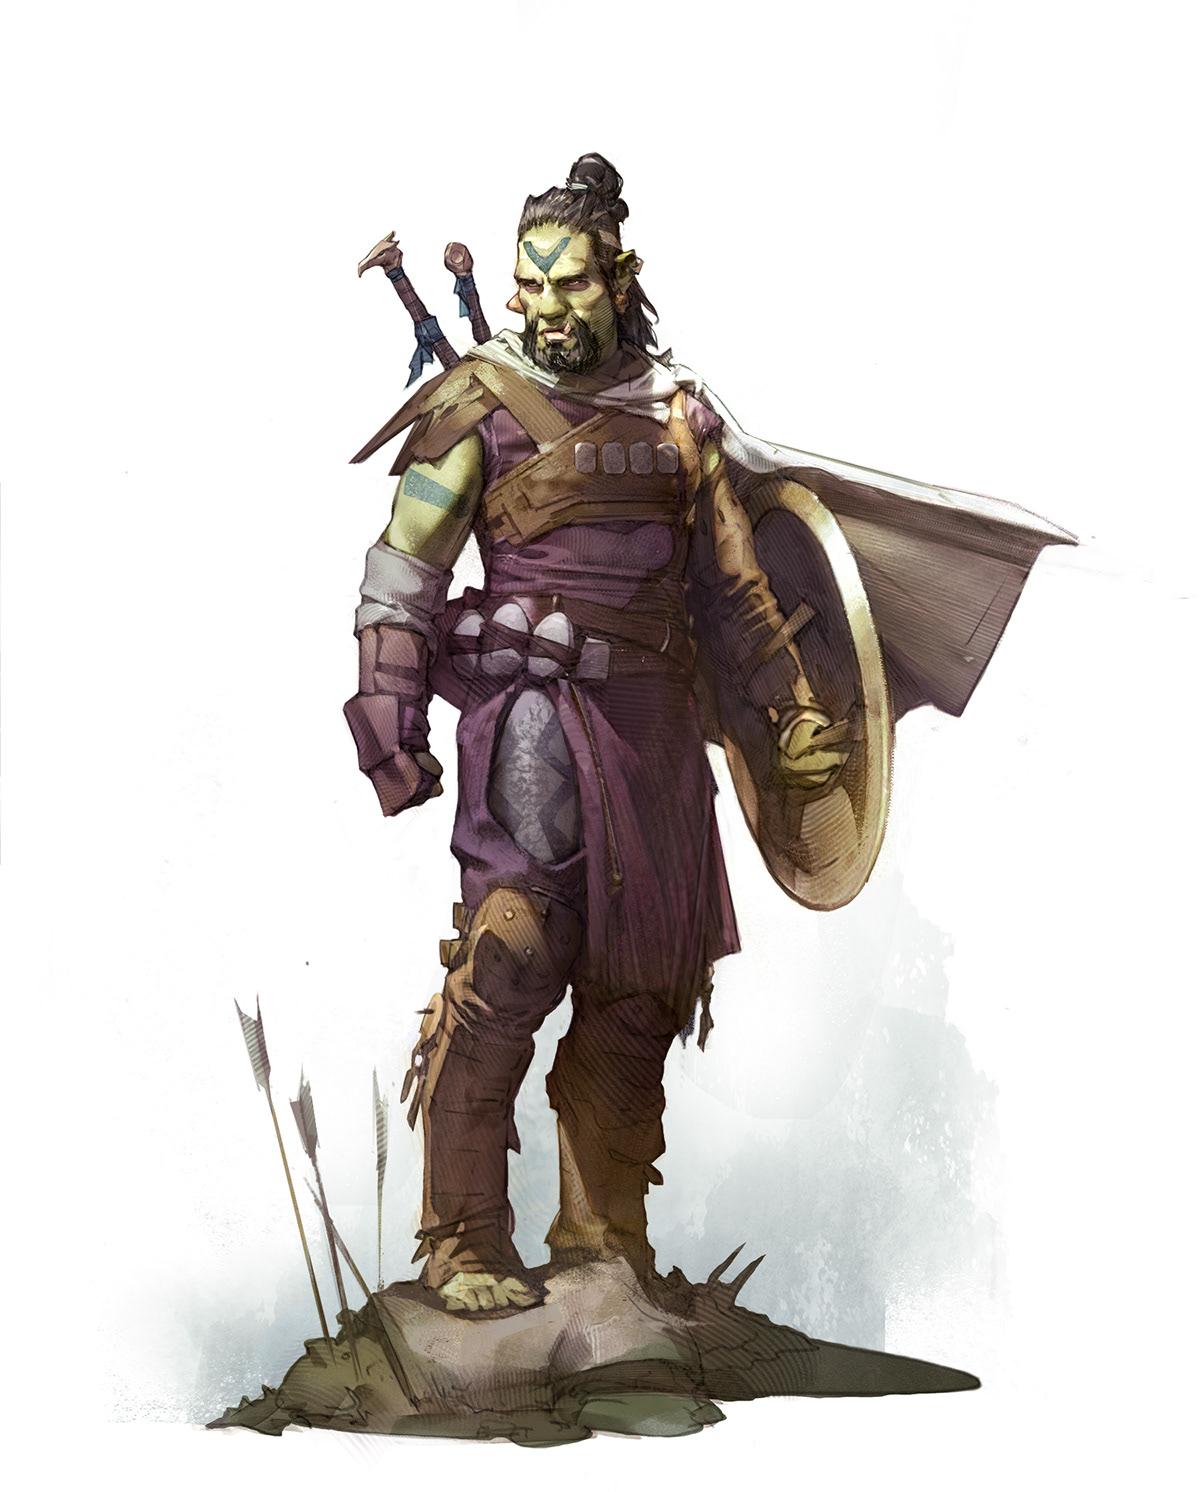 character art Character design  concept art digital Digital Art  digital illustration fantasy science fiction star wars